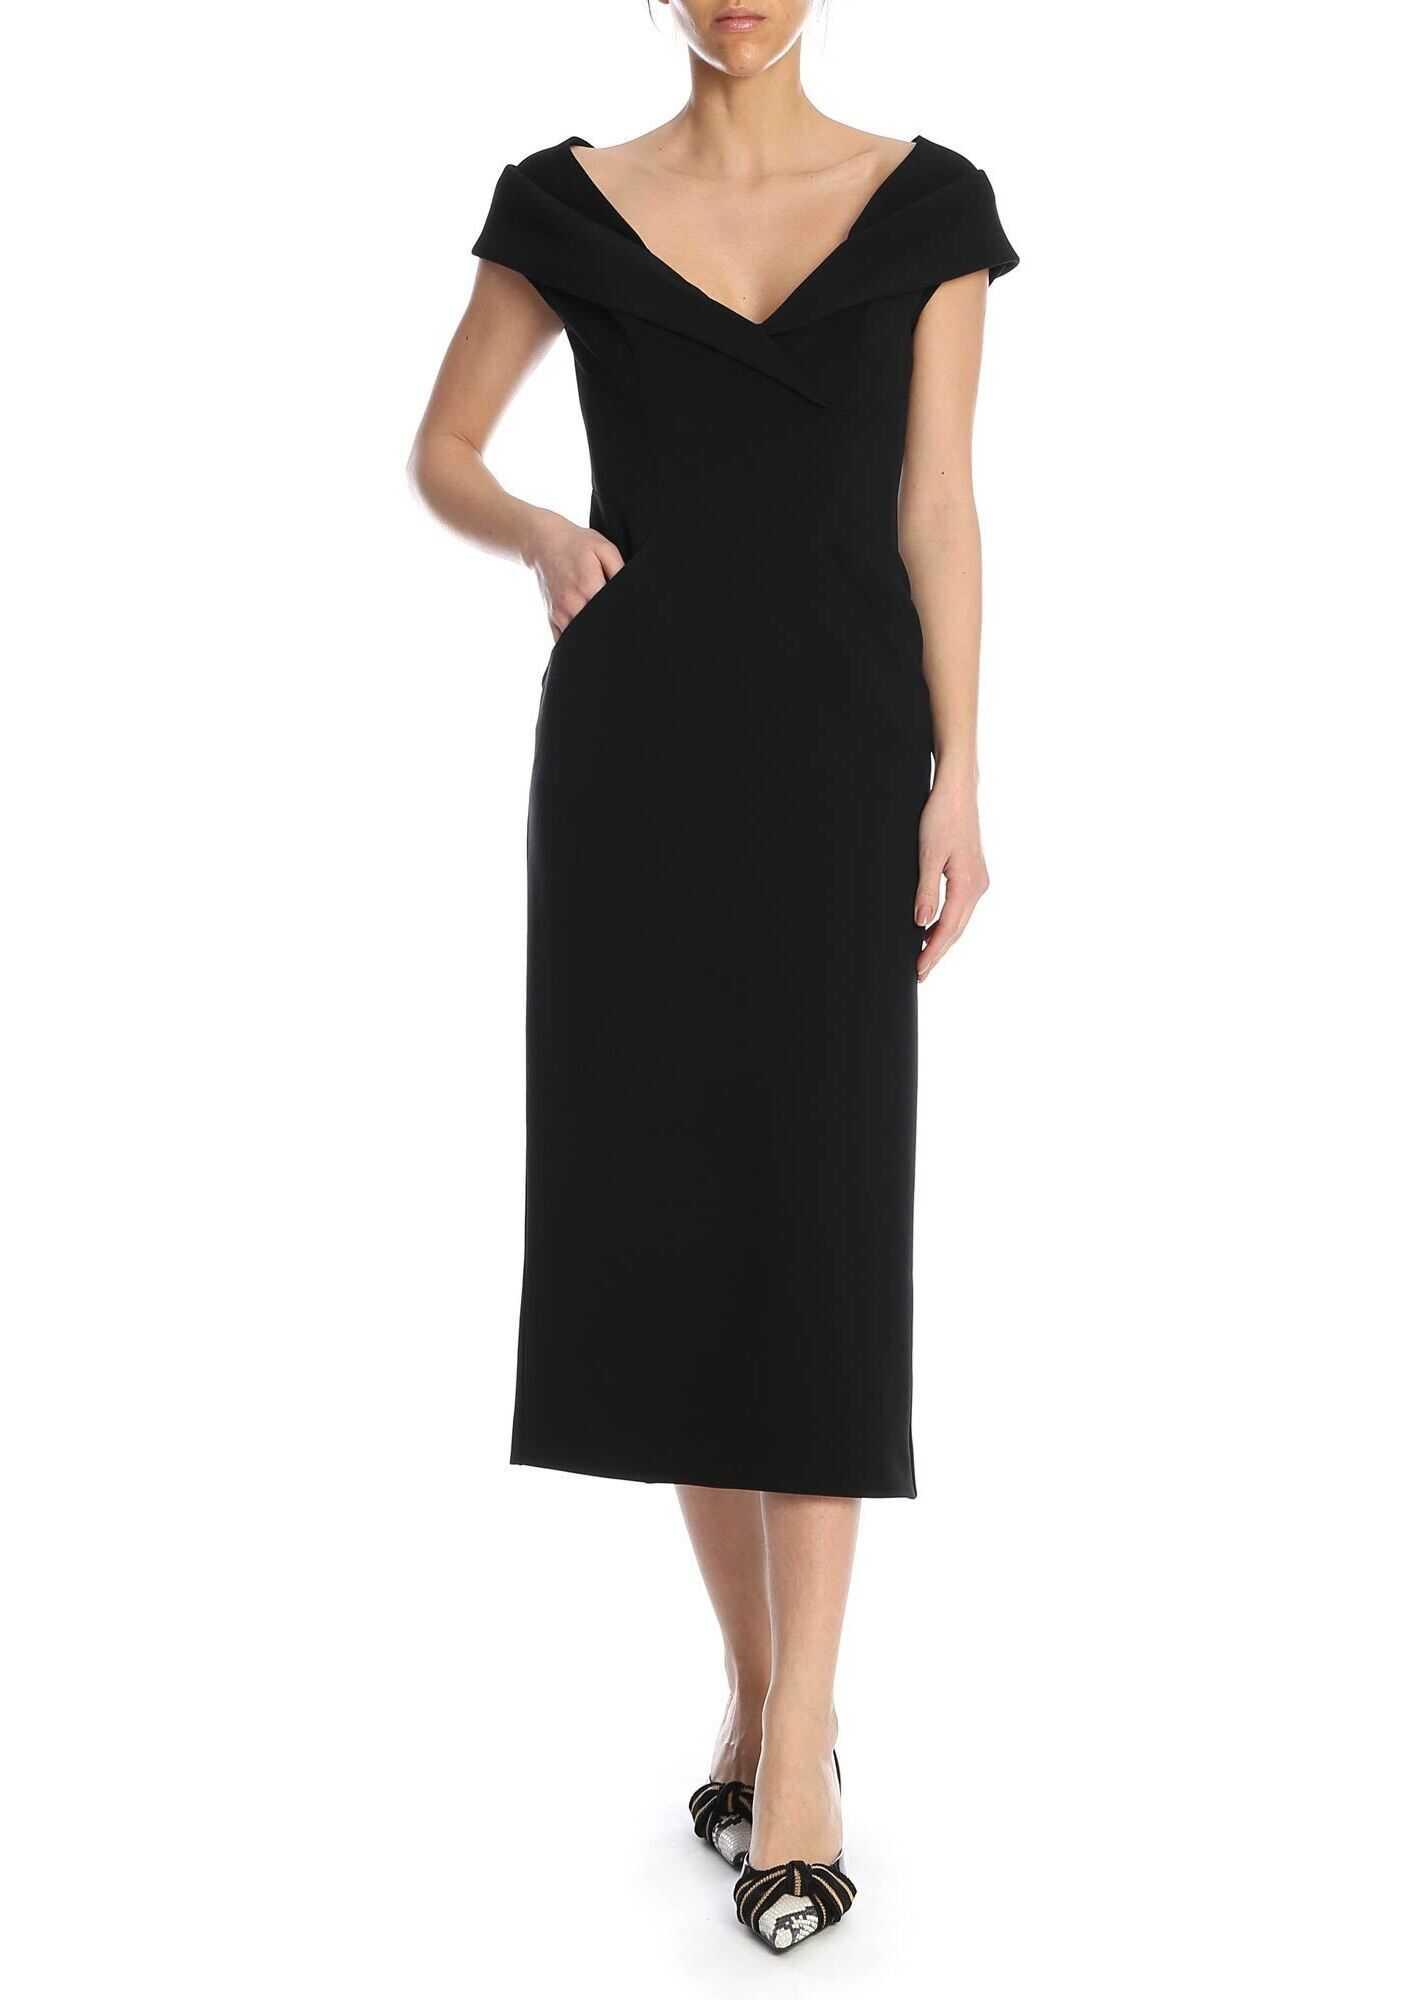 Ermanno Scervino Sleeveless Sheath Dress In Black Black